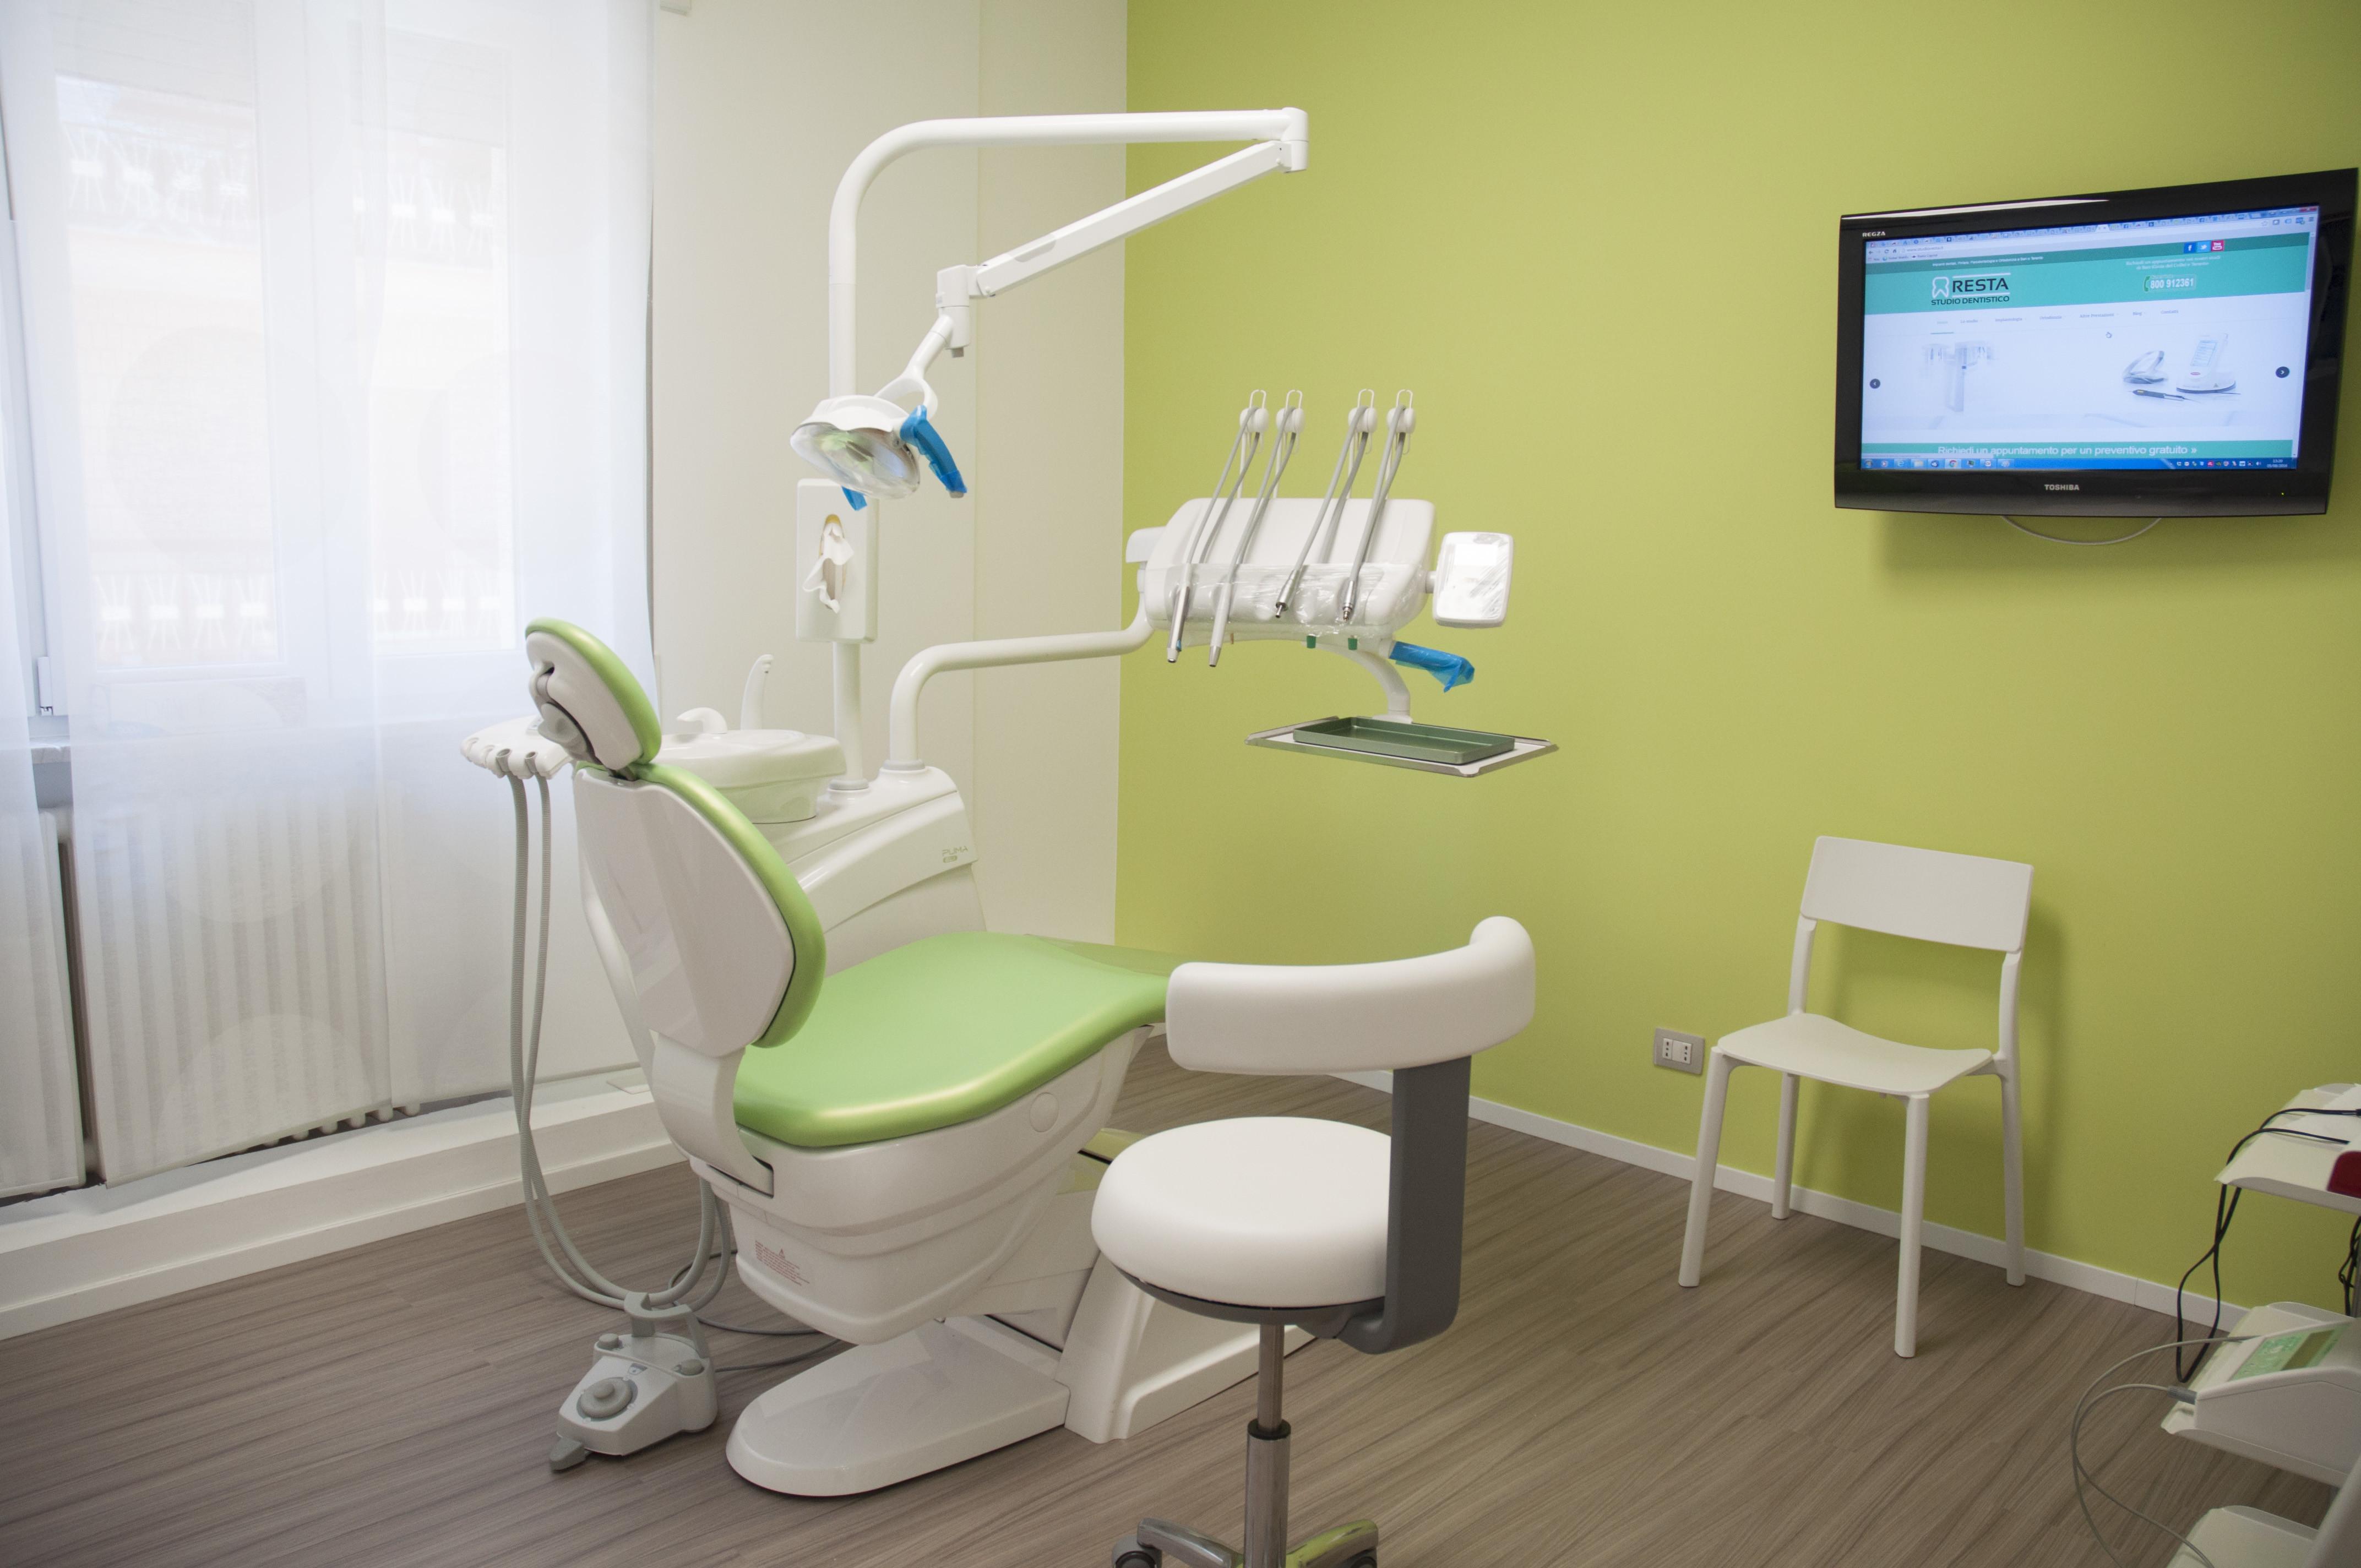 Studio 1 implantologia e Laser